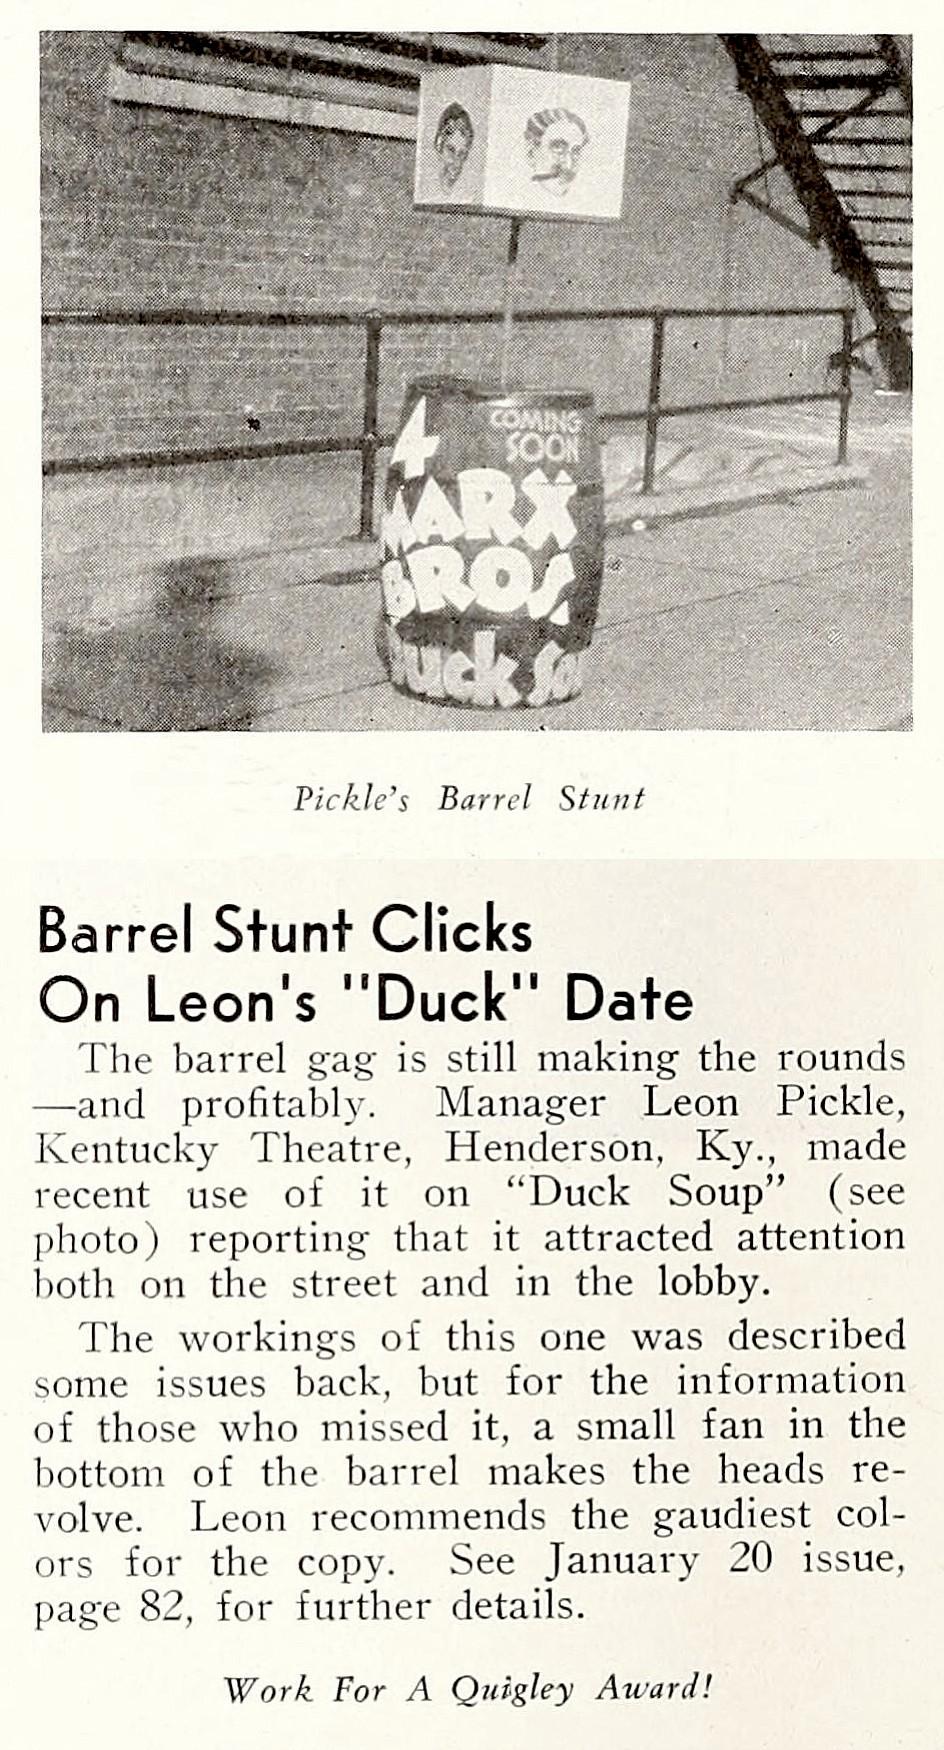 The old barrel gag! SHOWMEN'S TRADE REVIEW, April 21, 1933.